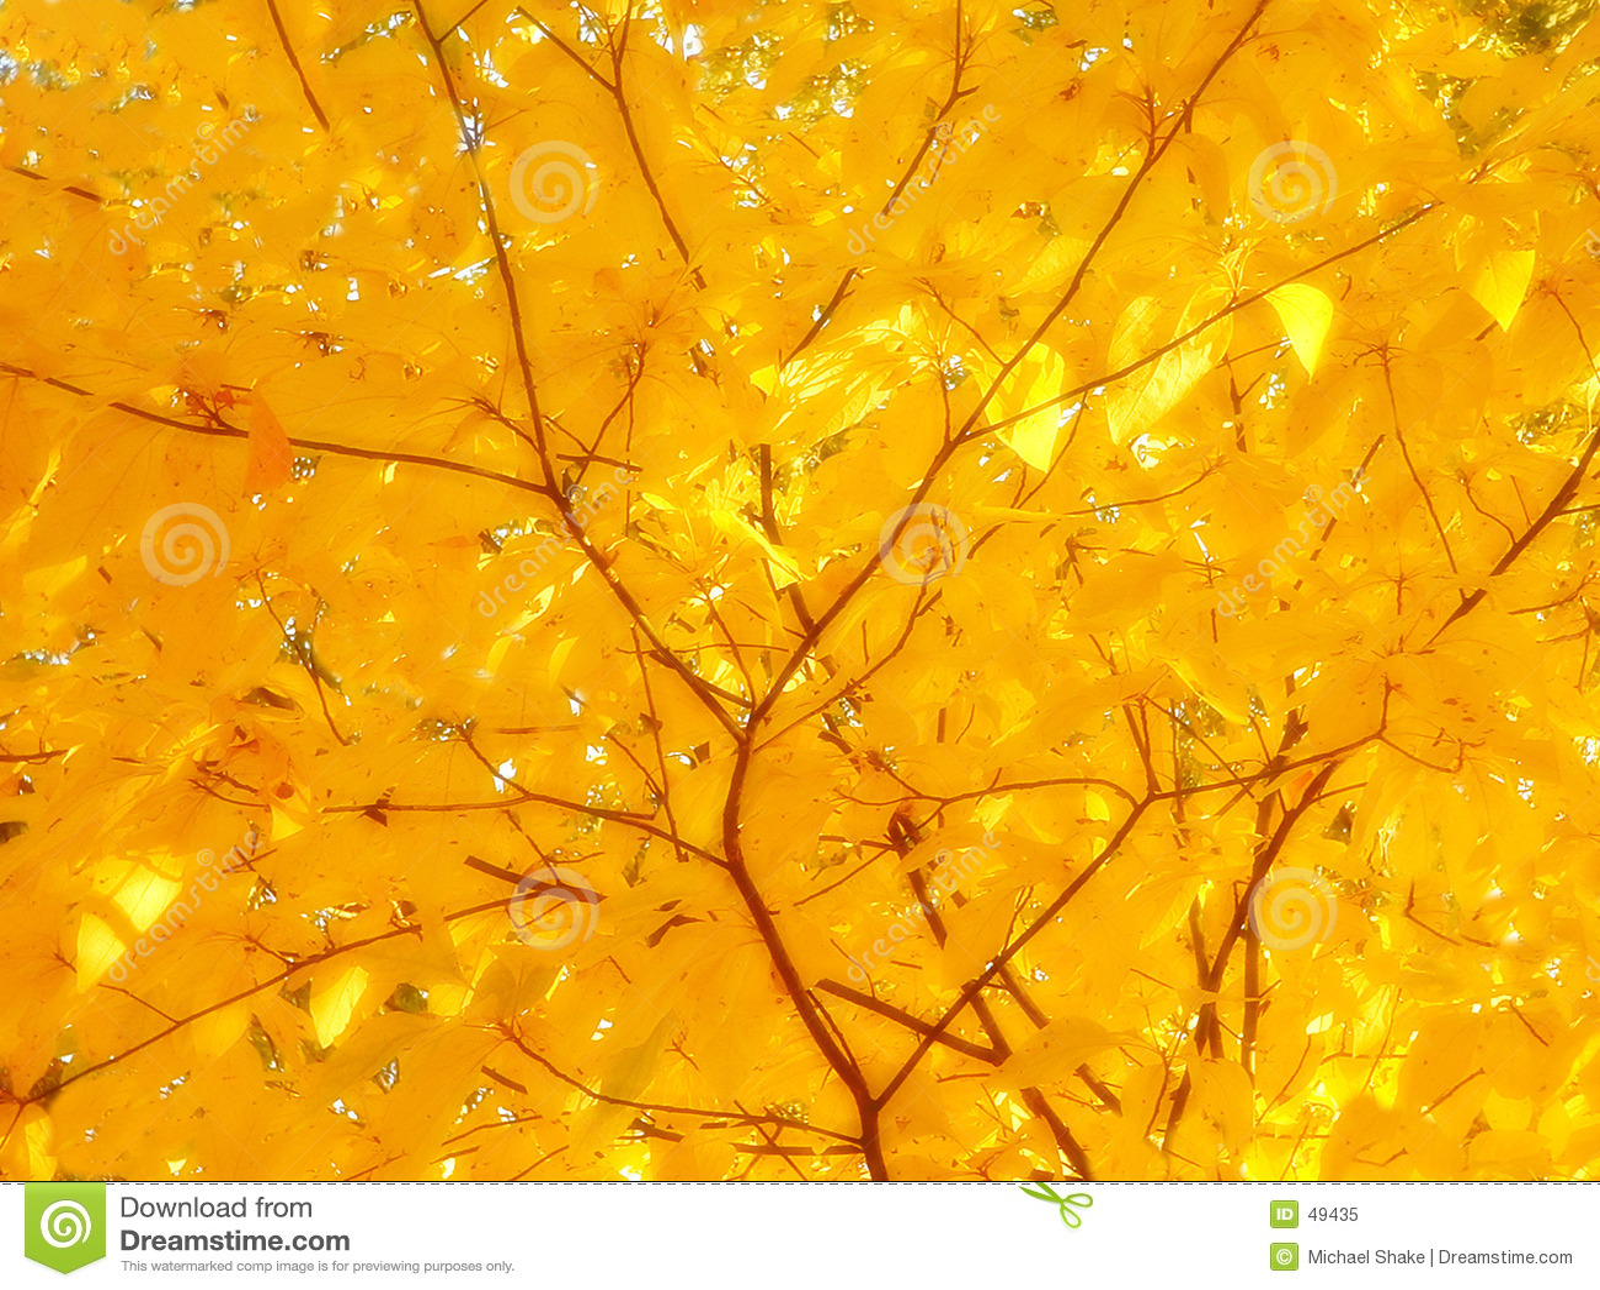 Sunshine on yellow leaves